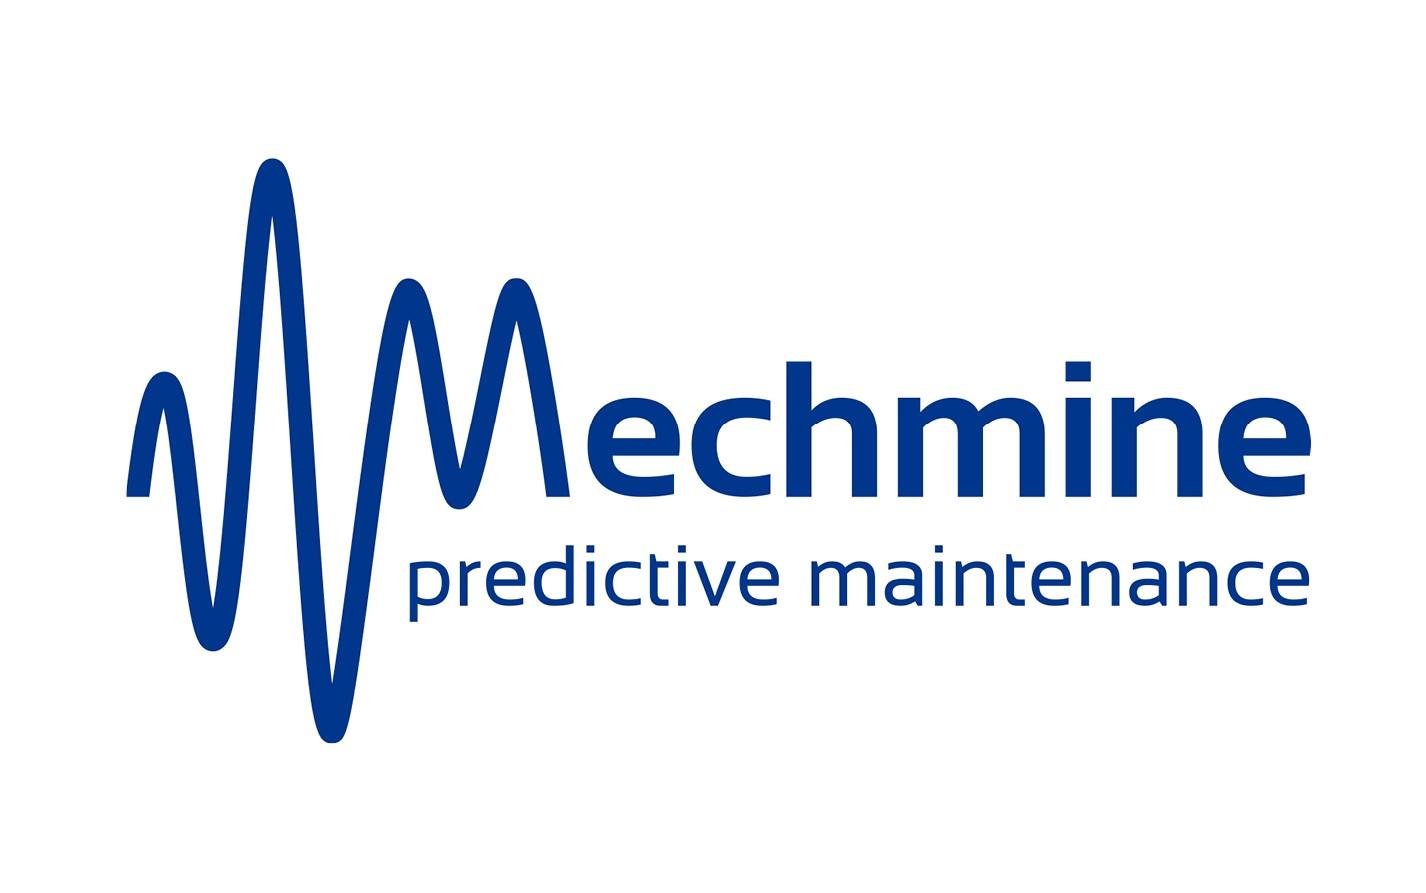 mechmine